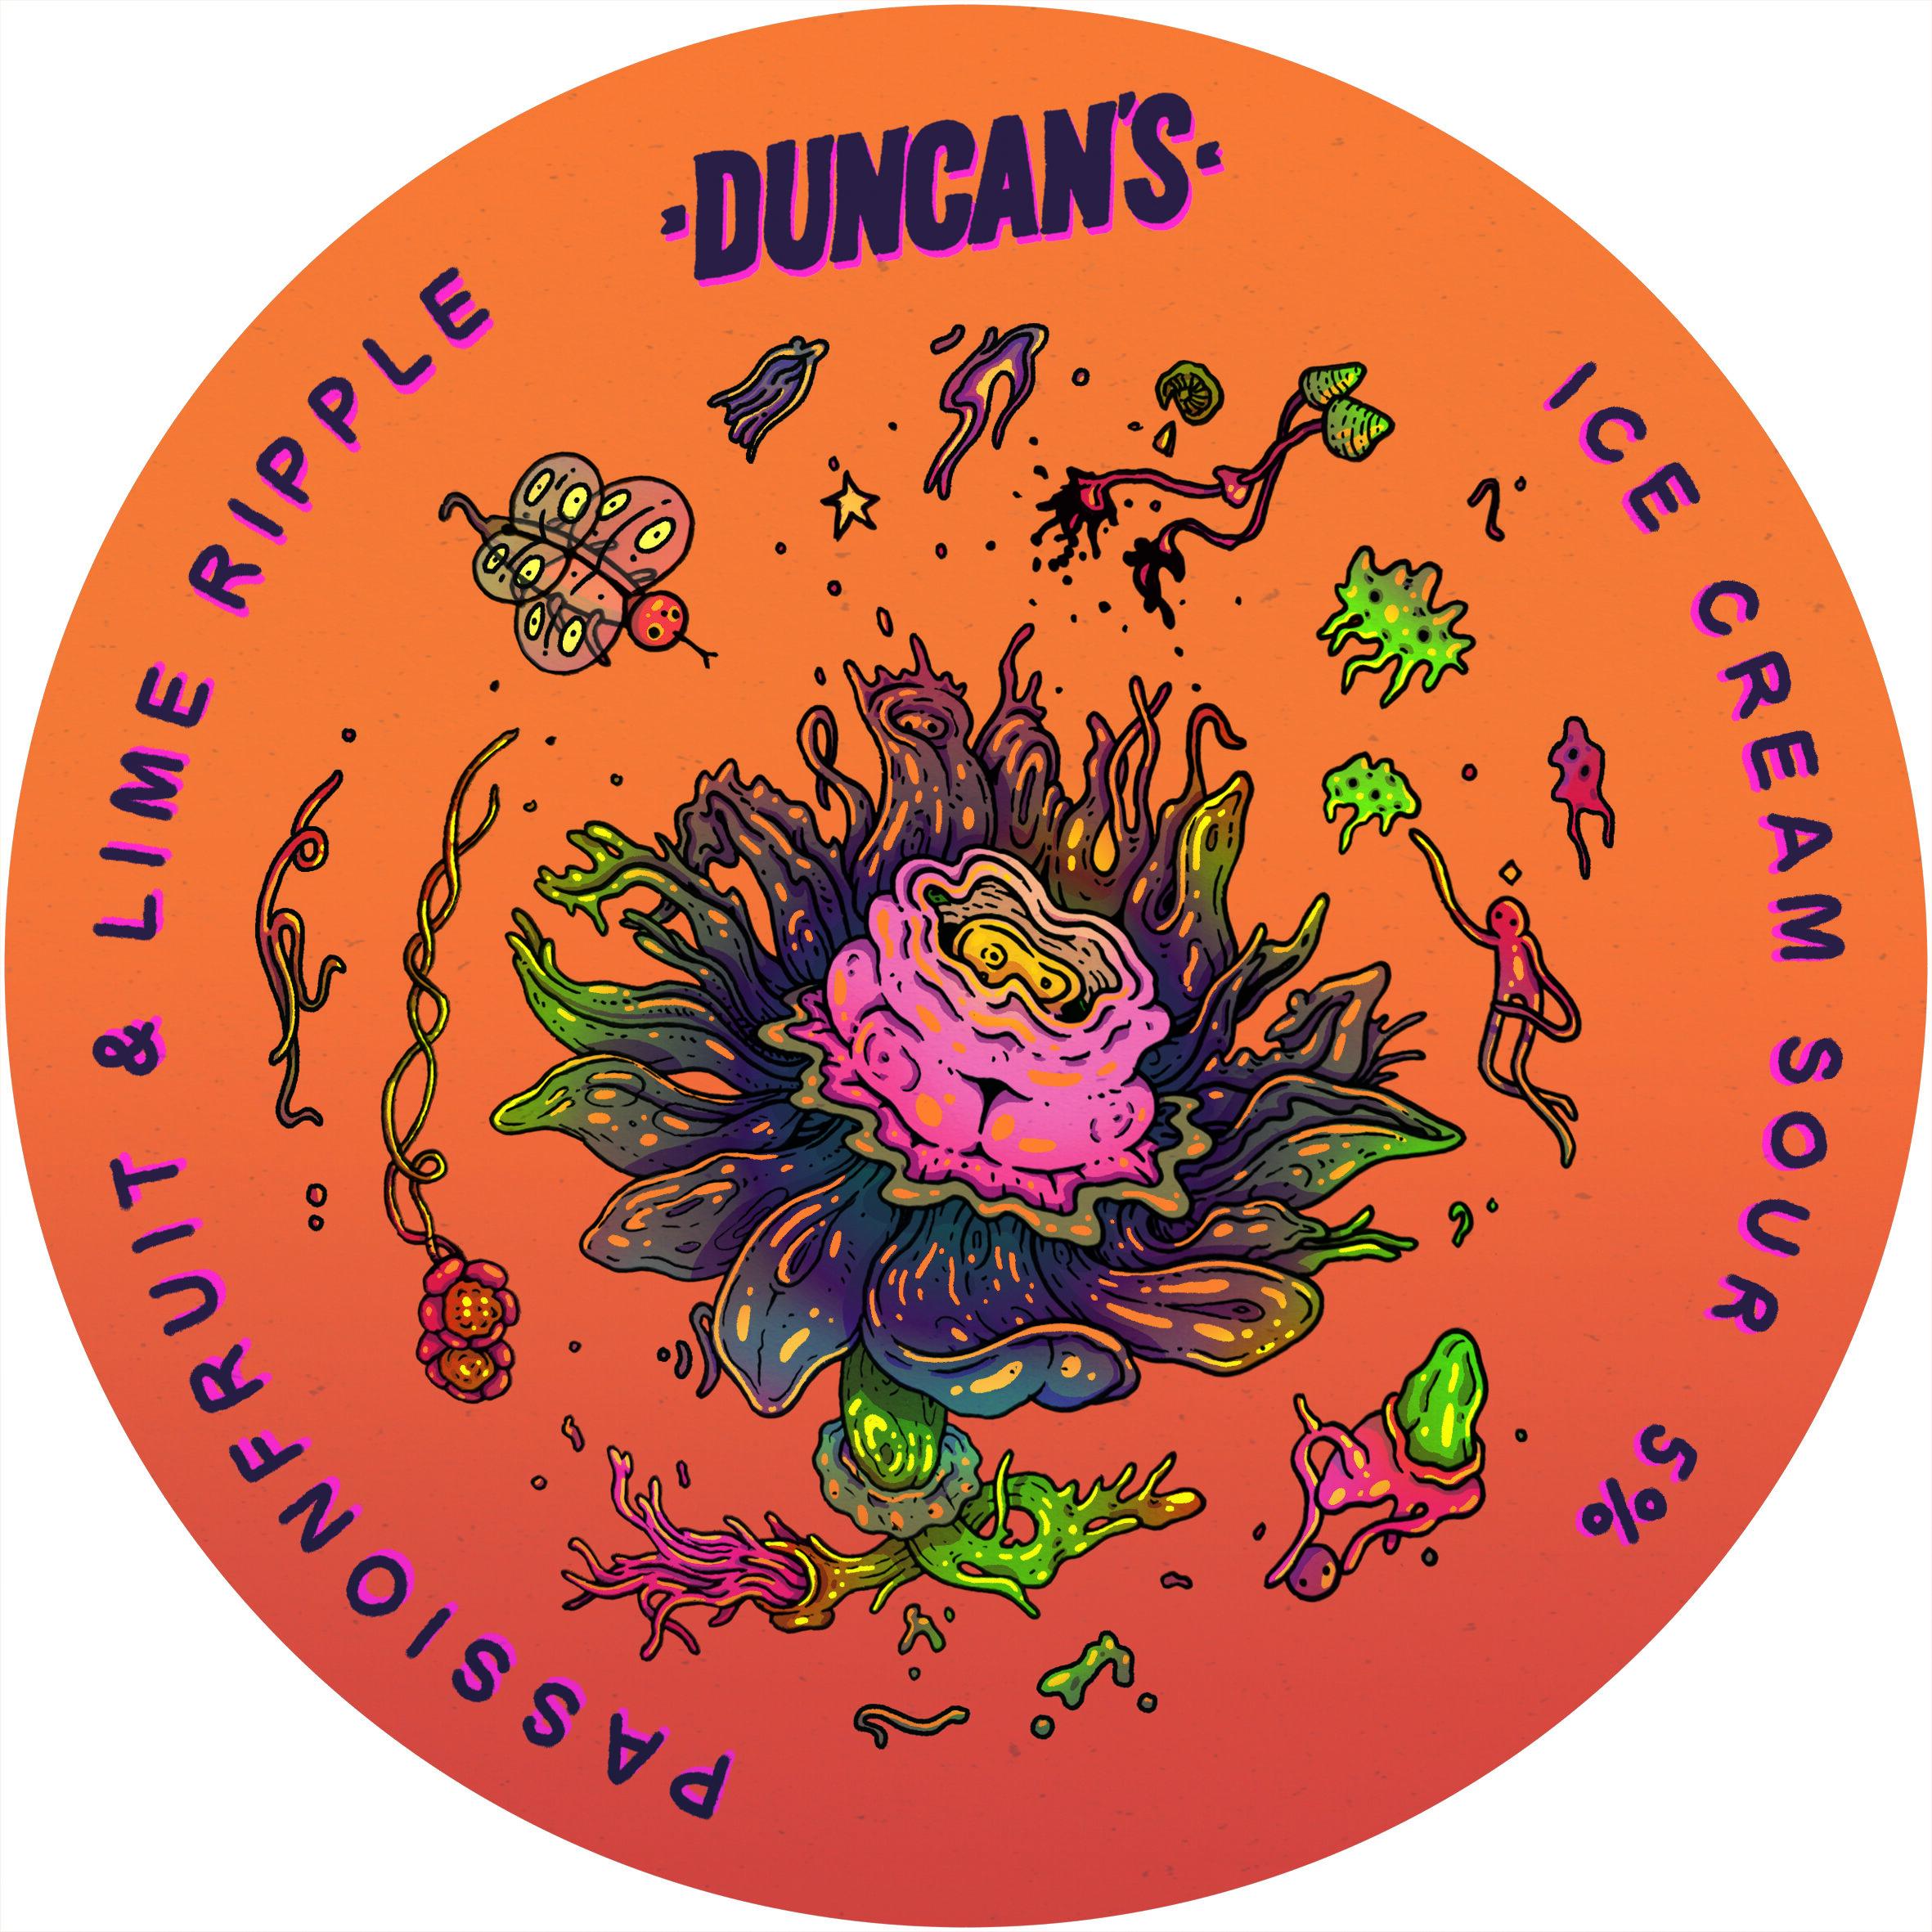 duncans-passionfruit-lime-ripple-tap.jpg